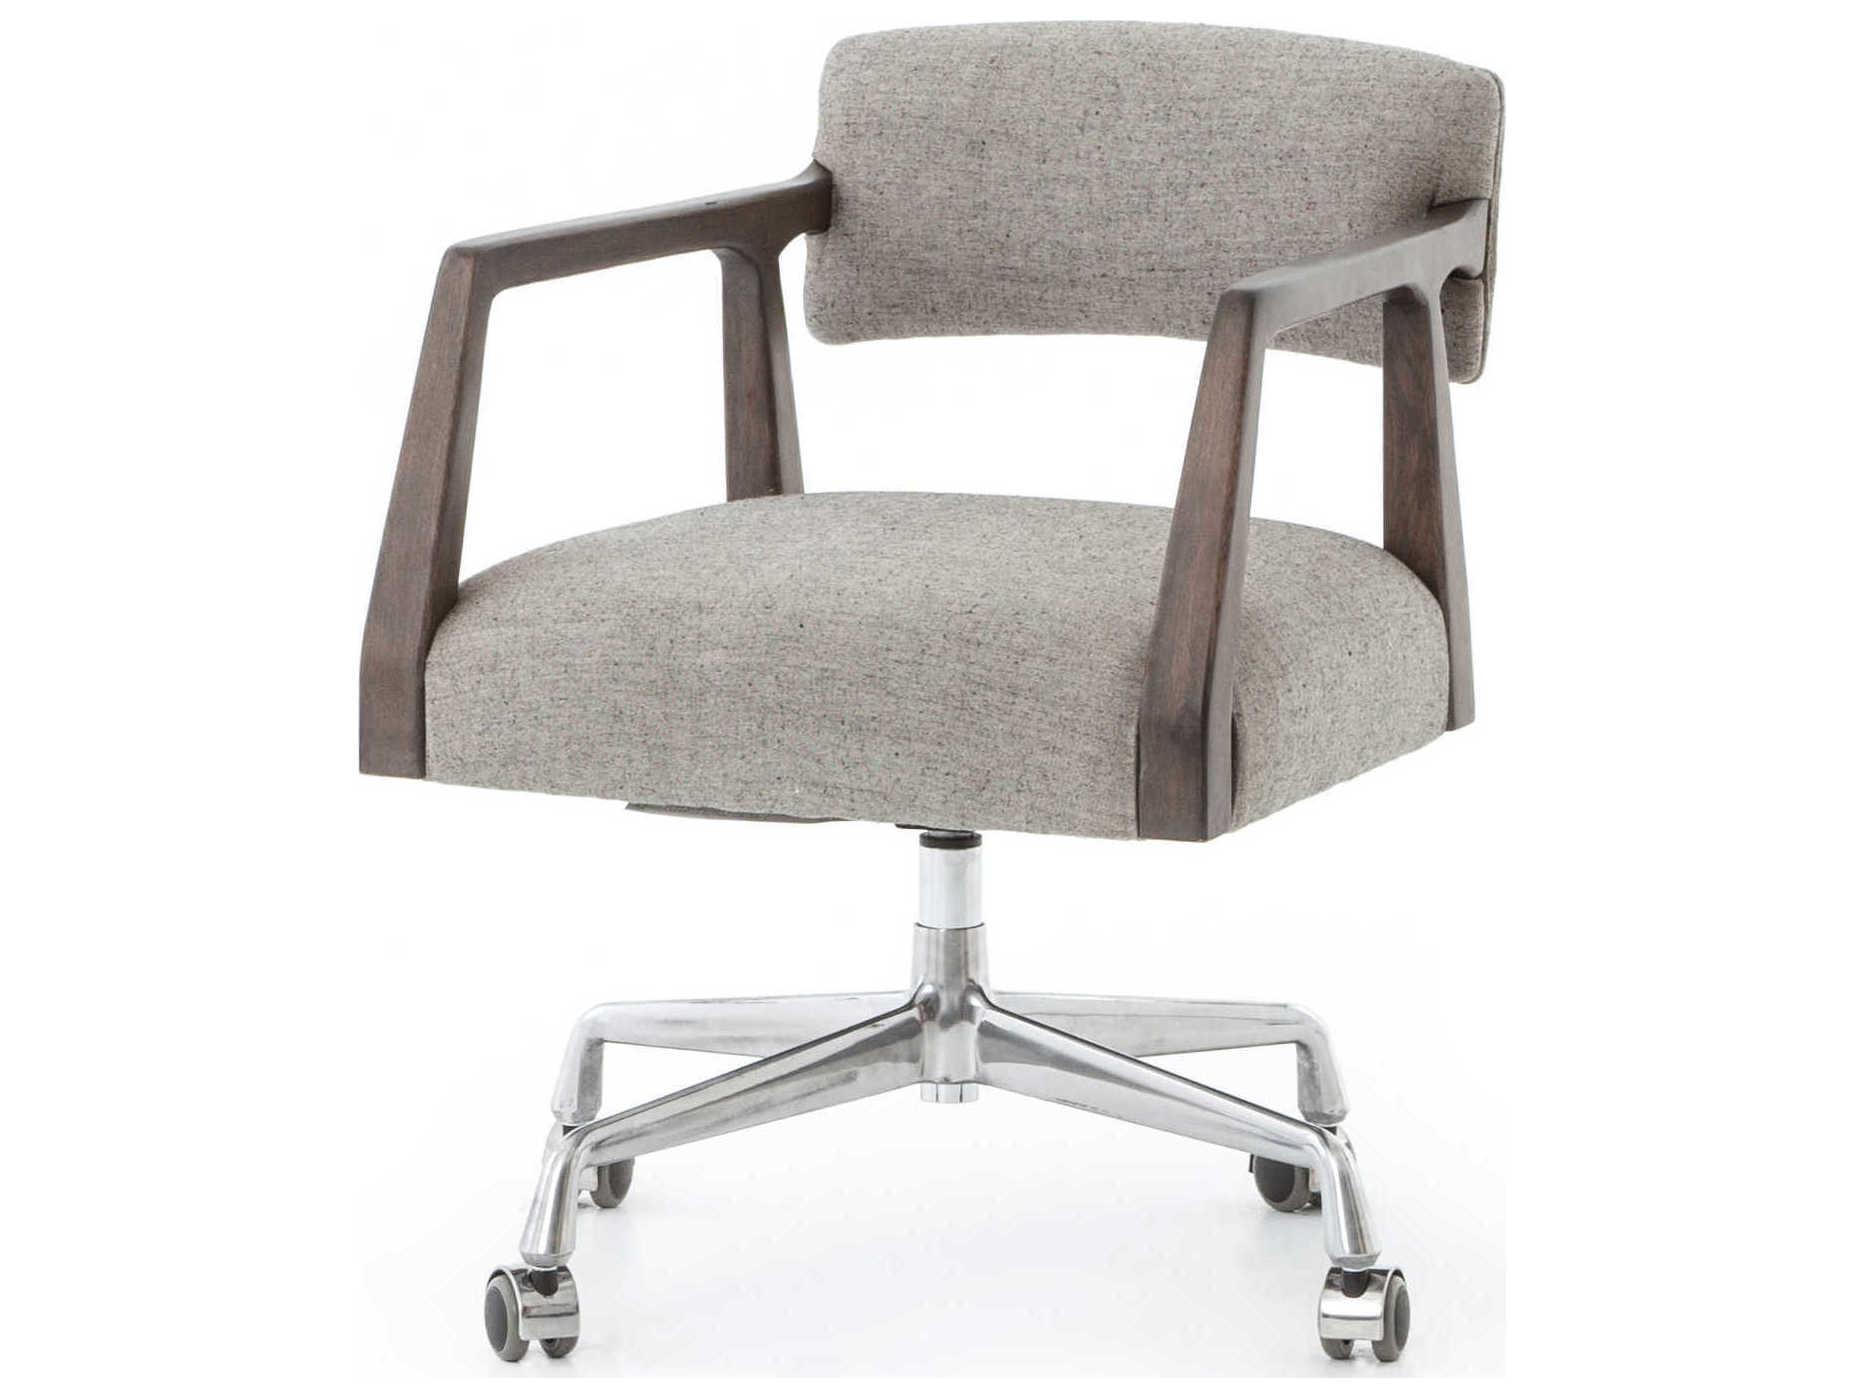 Four Hands Abbott Burnt Nettlewood Ives White Grey Stainless Steel Computer Chair